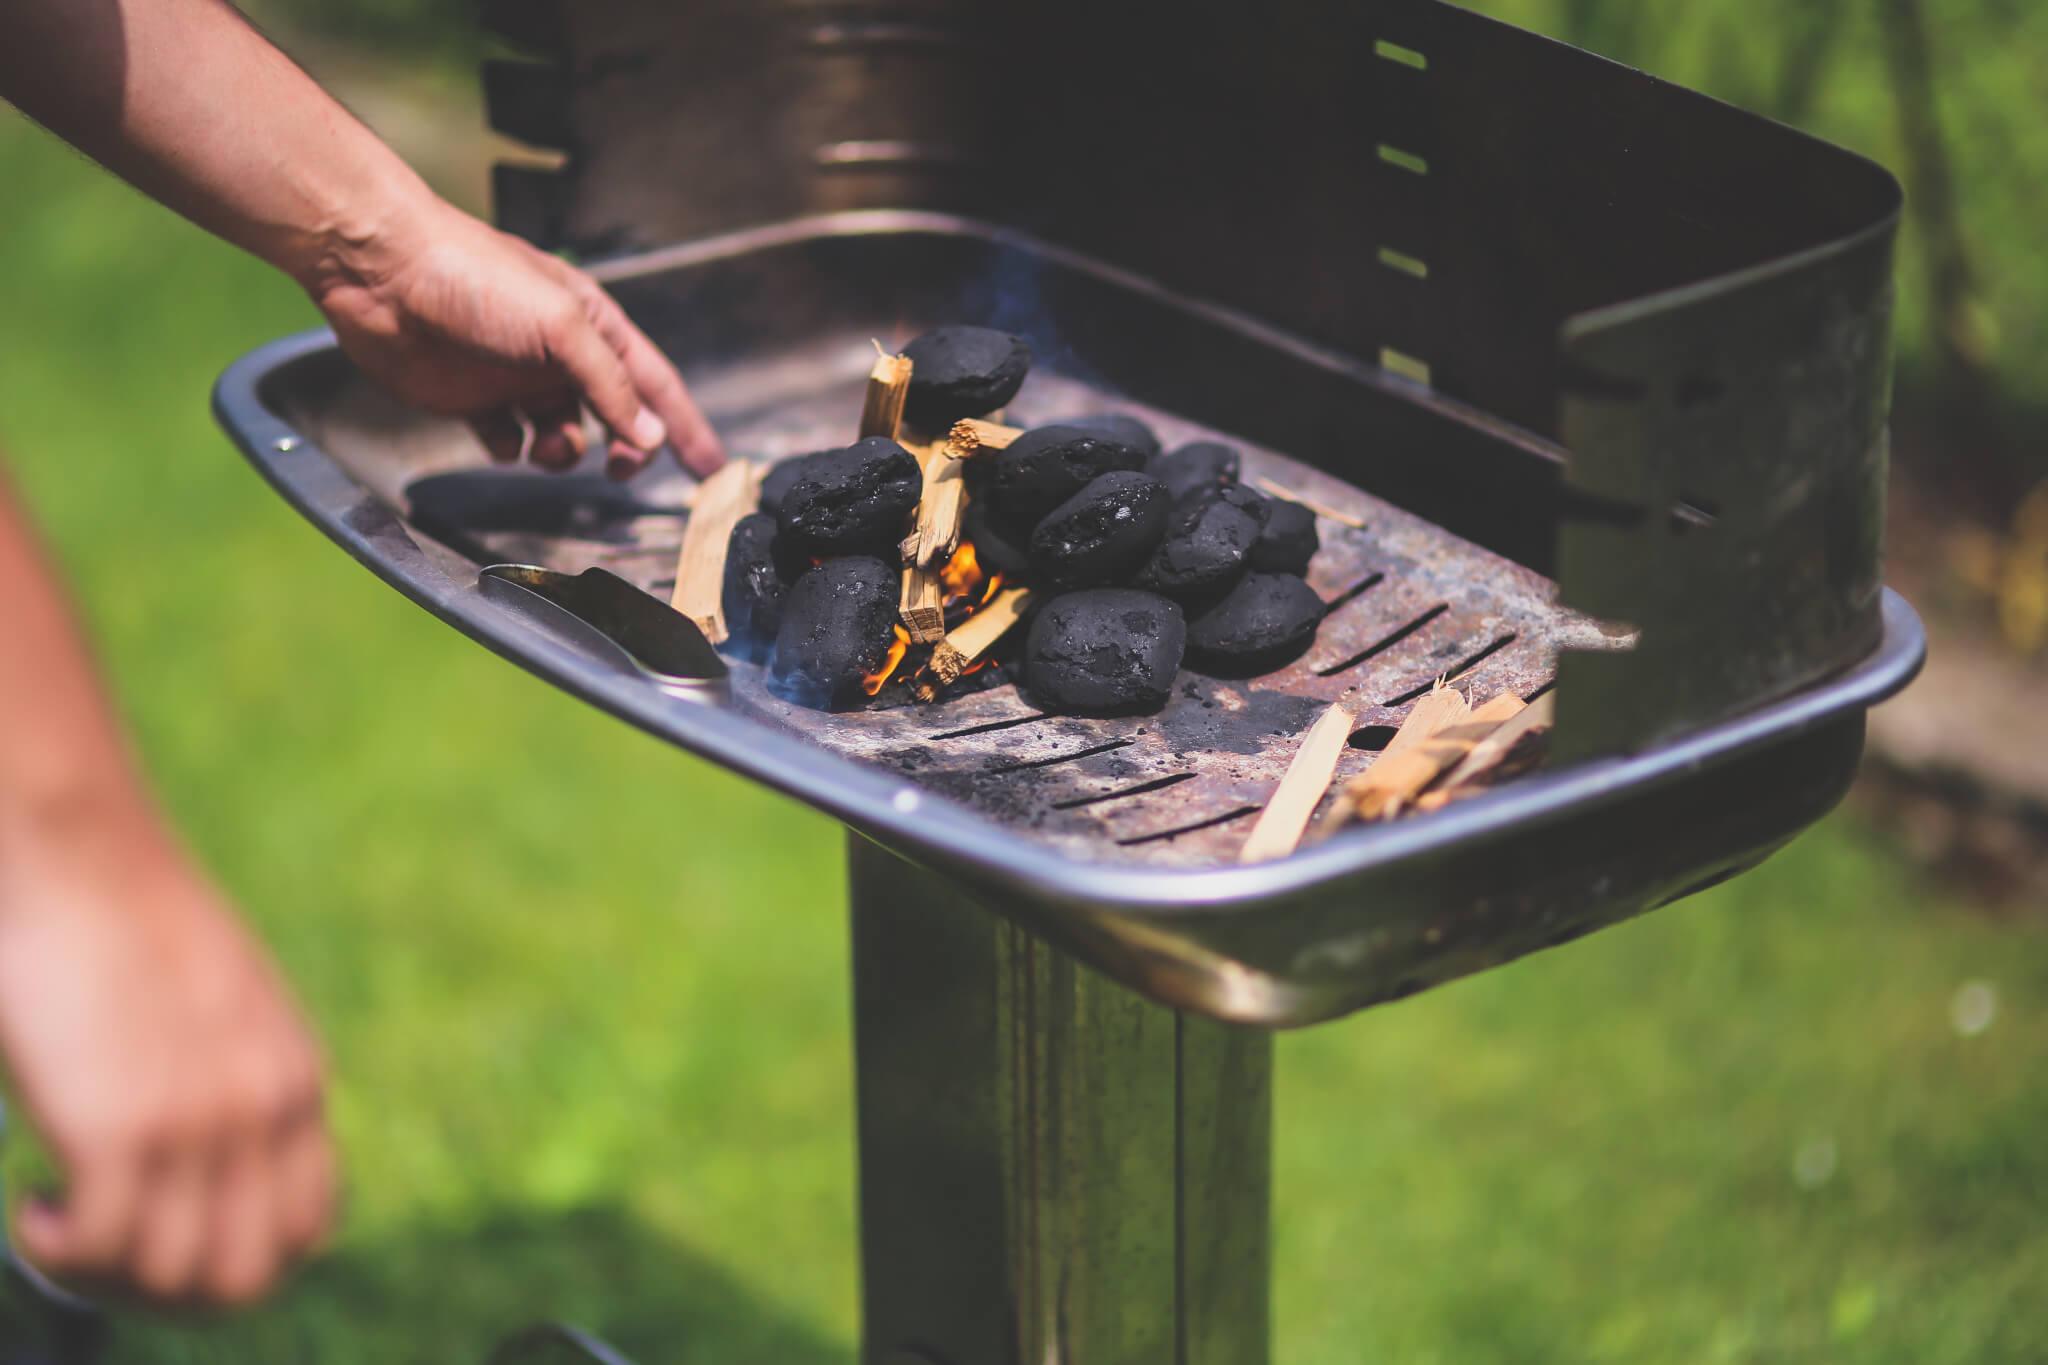 Holzkohlegrill anfeuern mit holz und kohle burgerpressen for Holzkohlegrill test